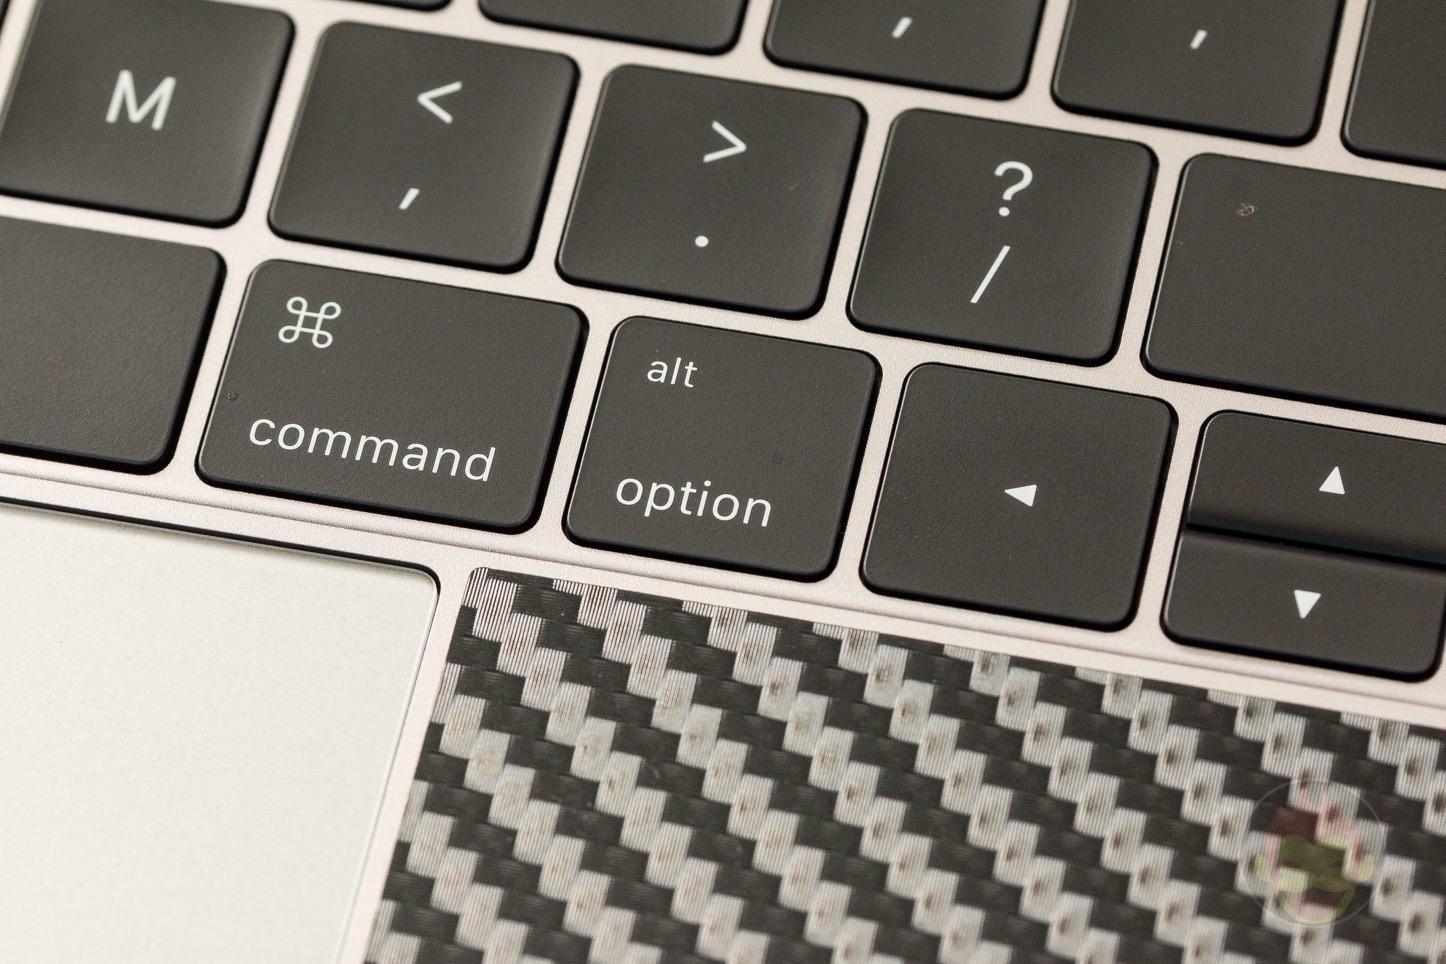 2016-MacBook-1.3GHz-Review-65.jpg